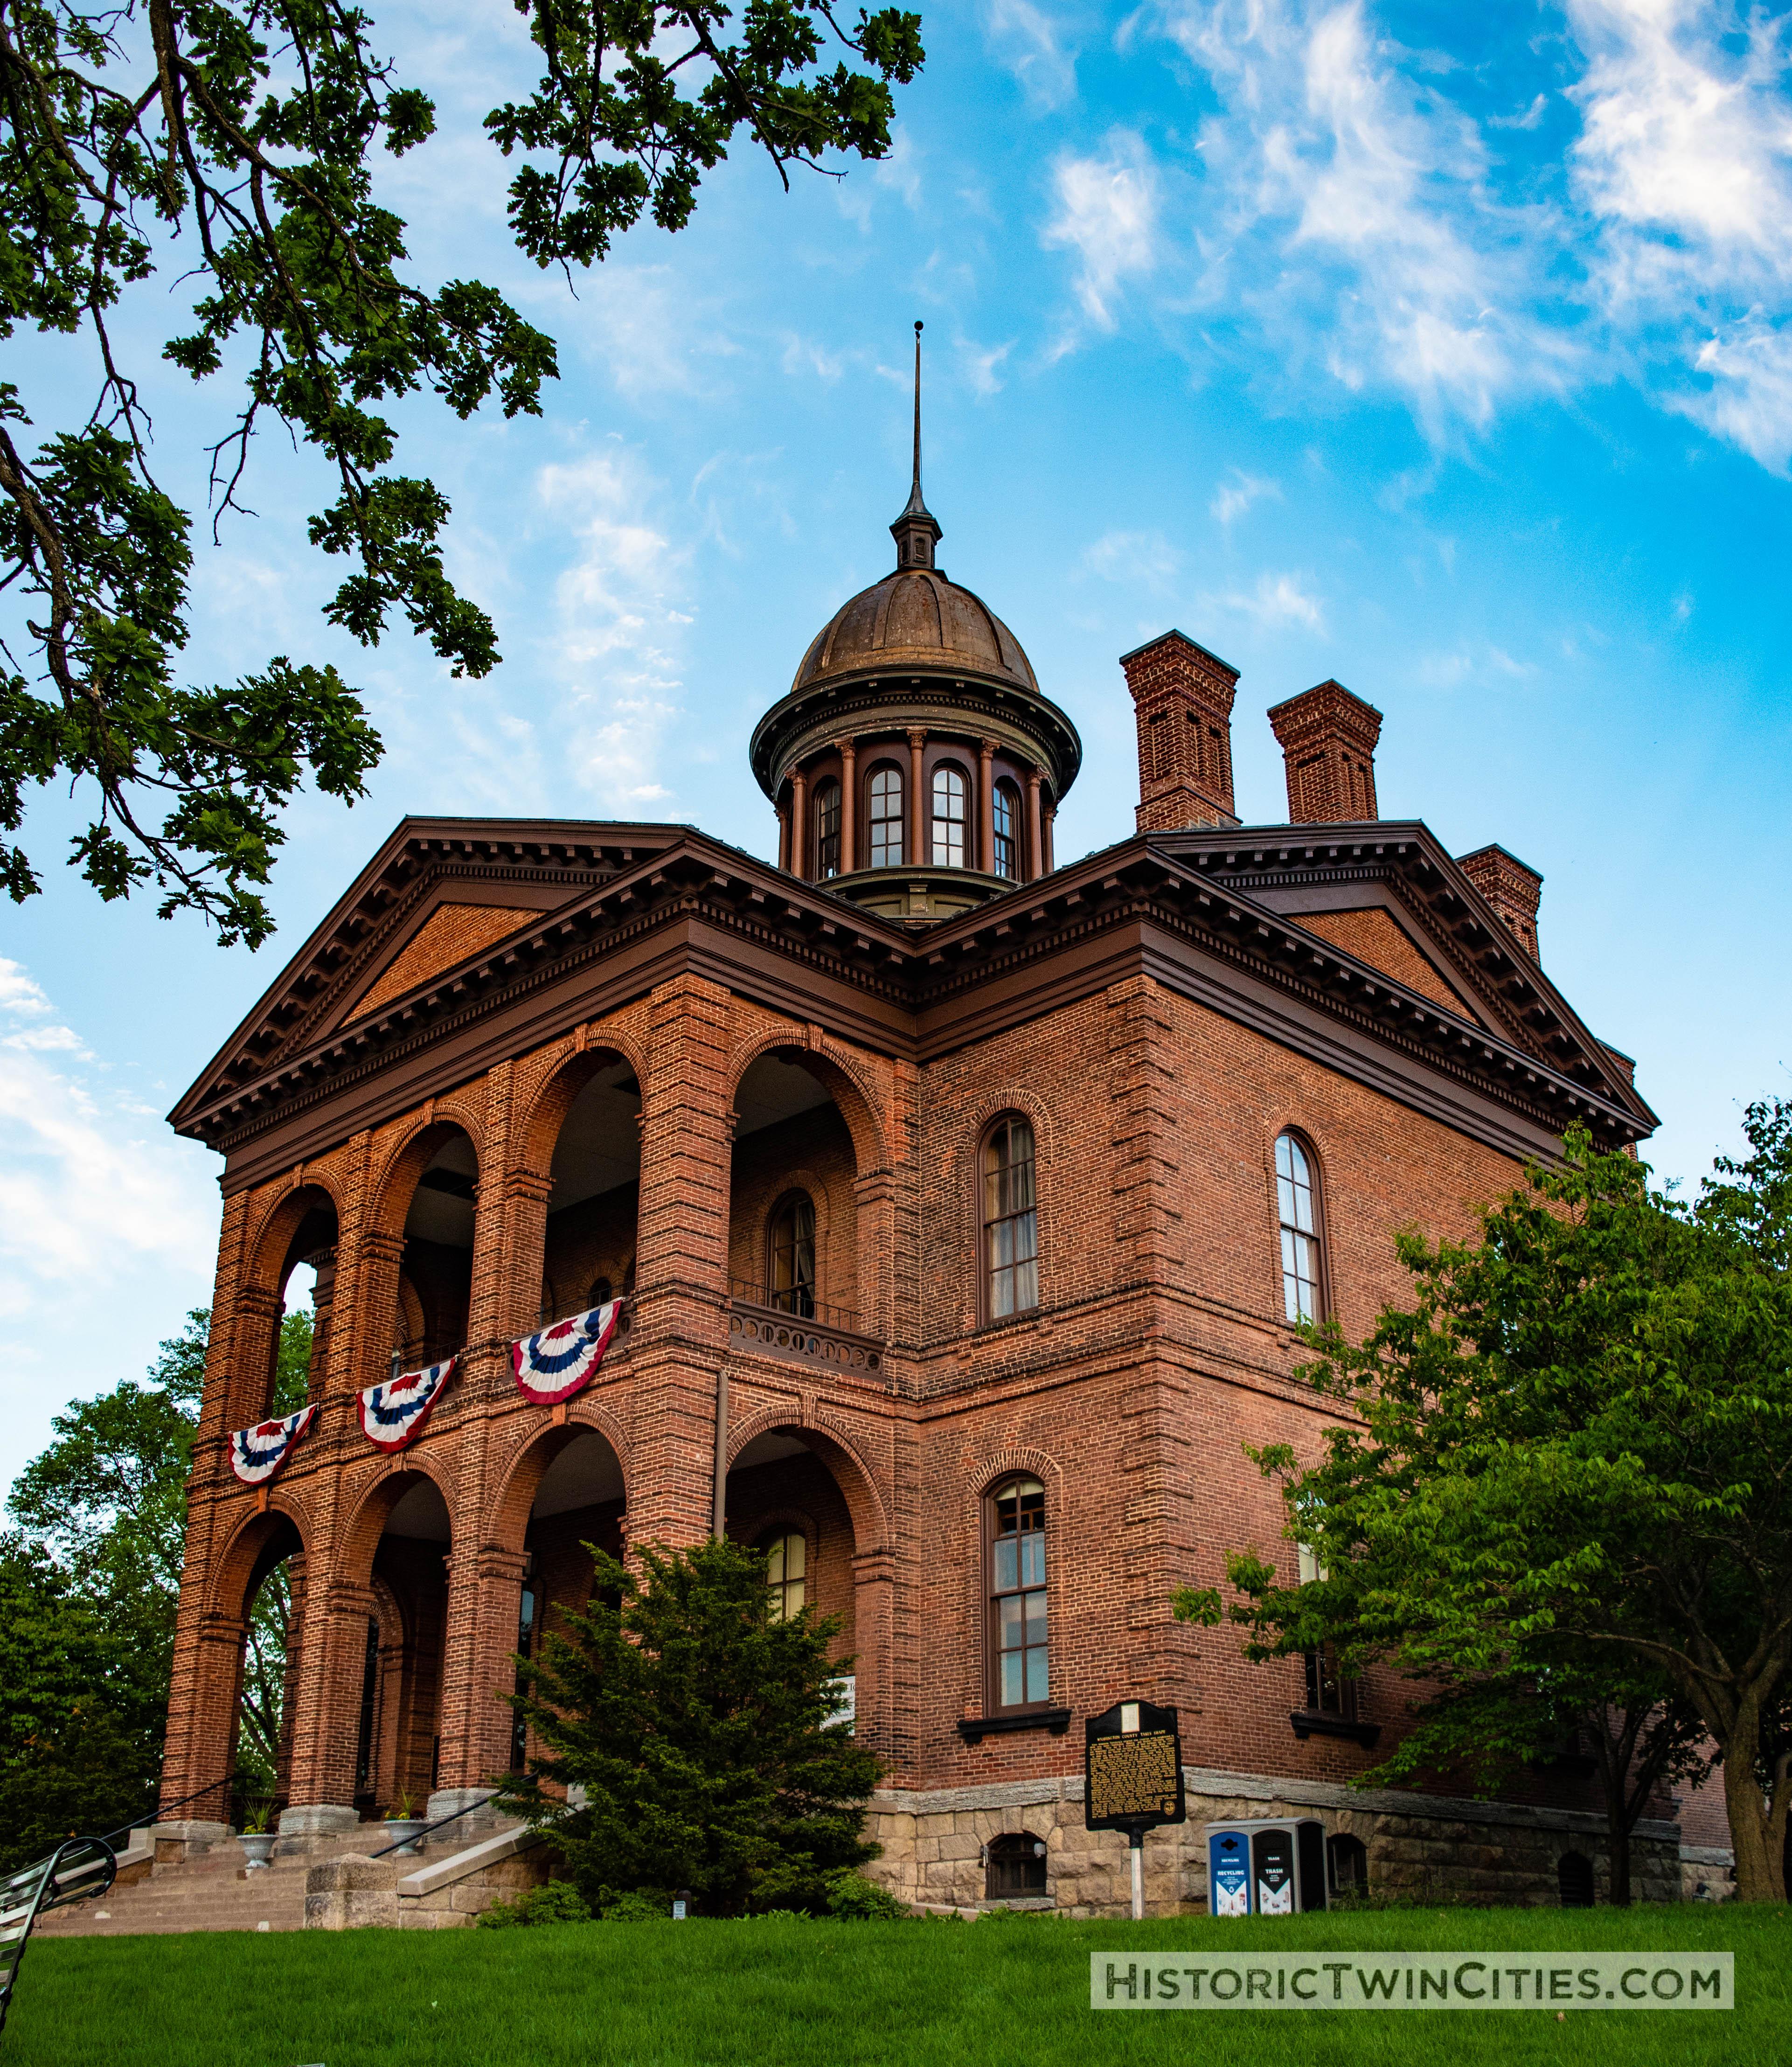 Washington County Courthouse - Stillwater, MN